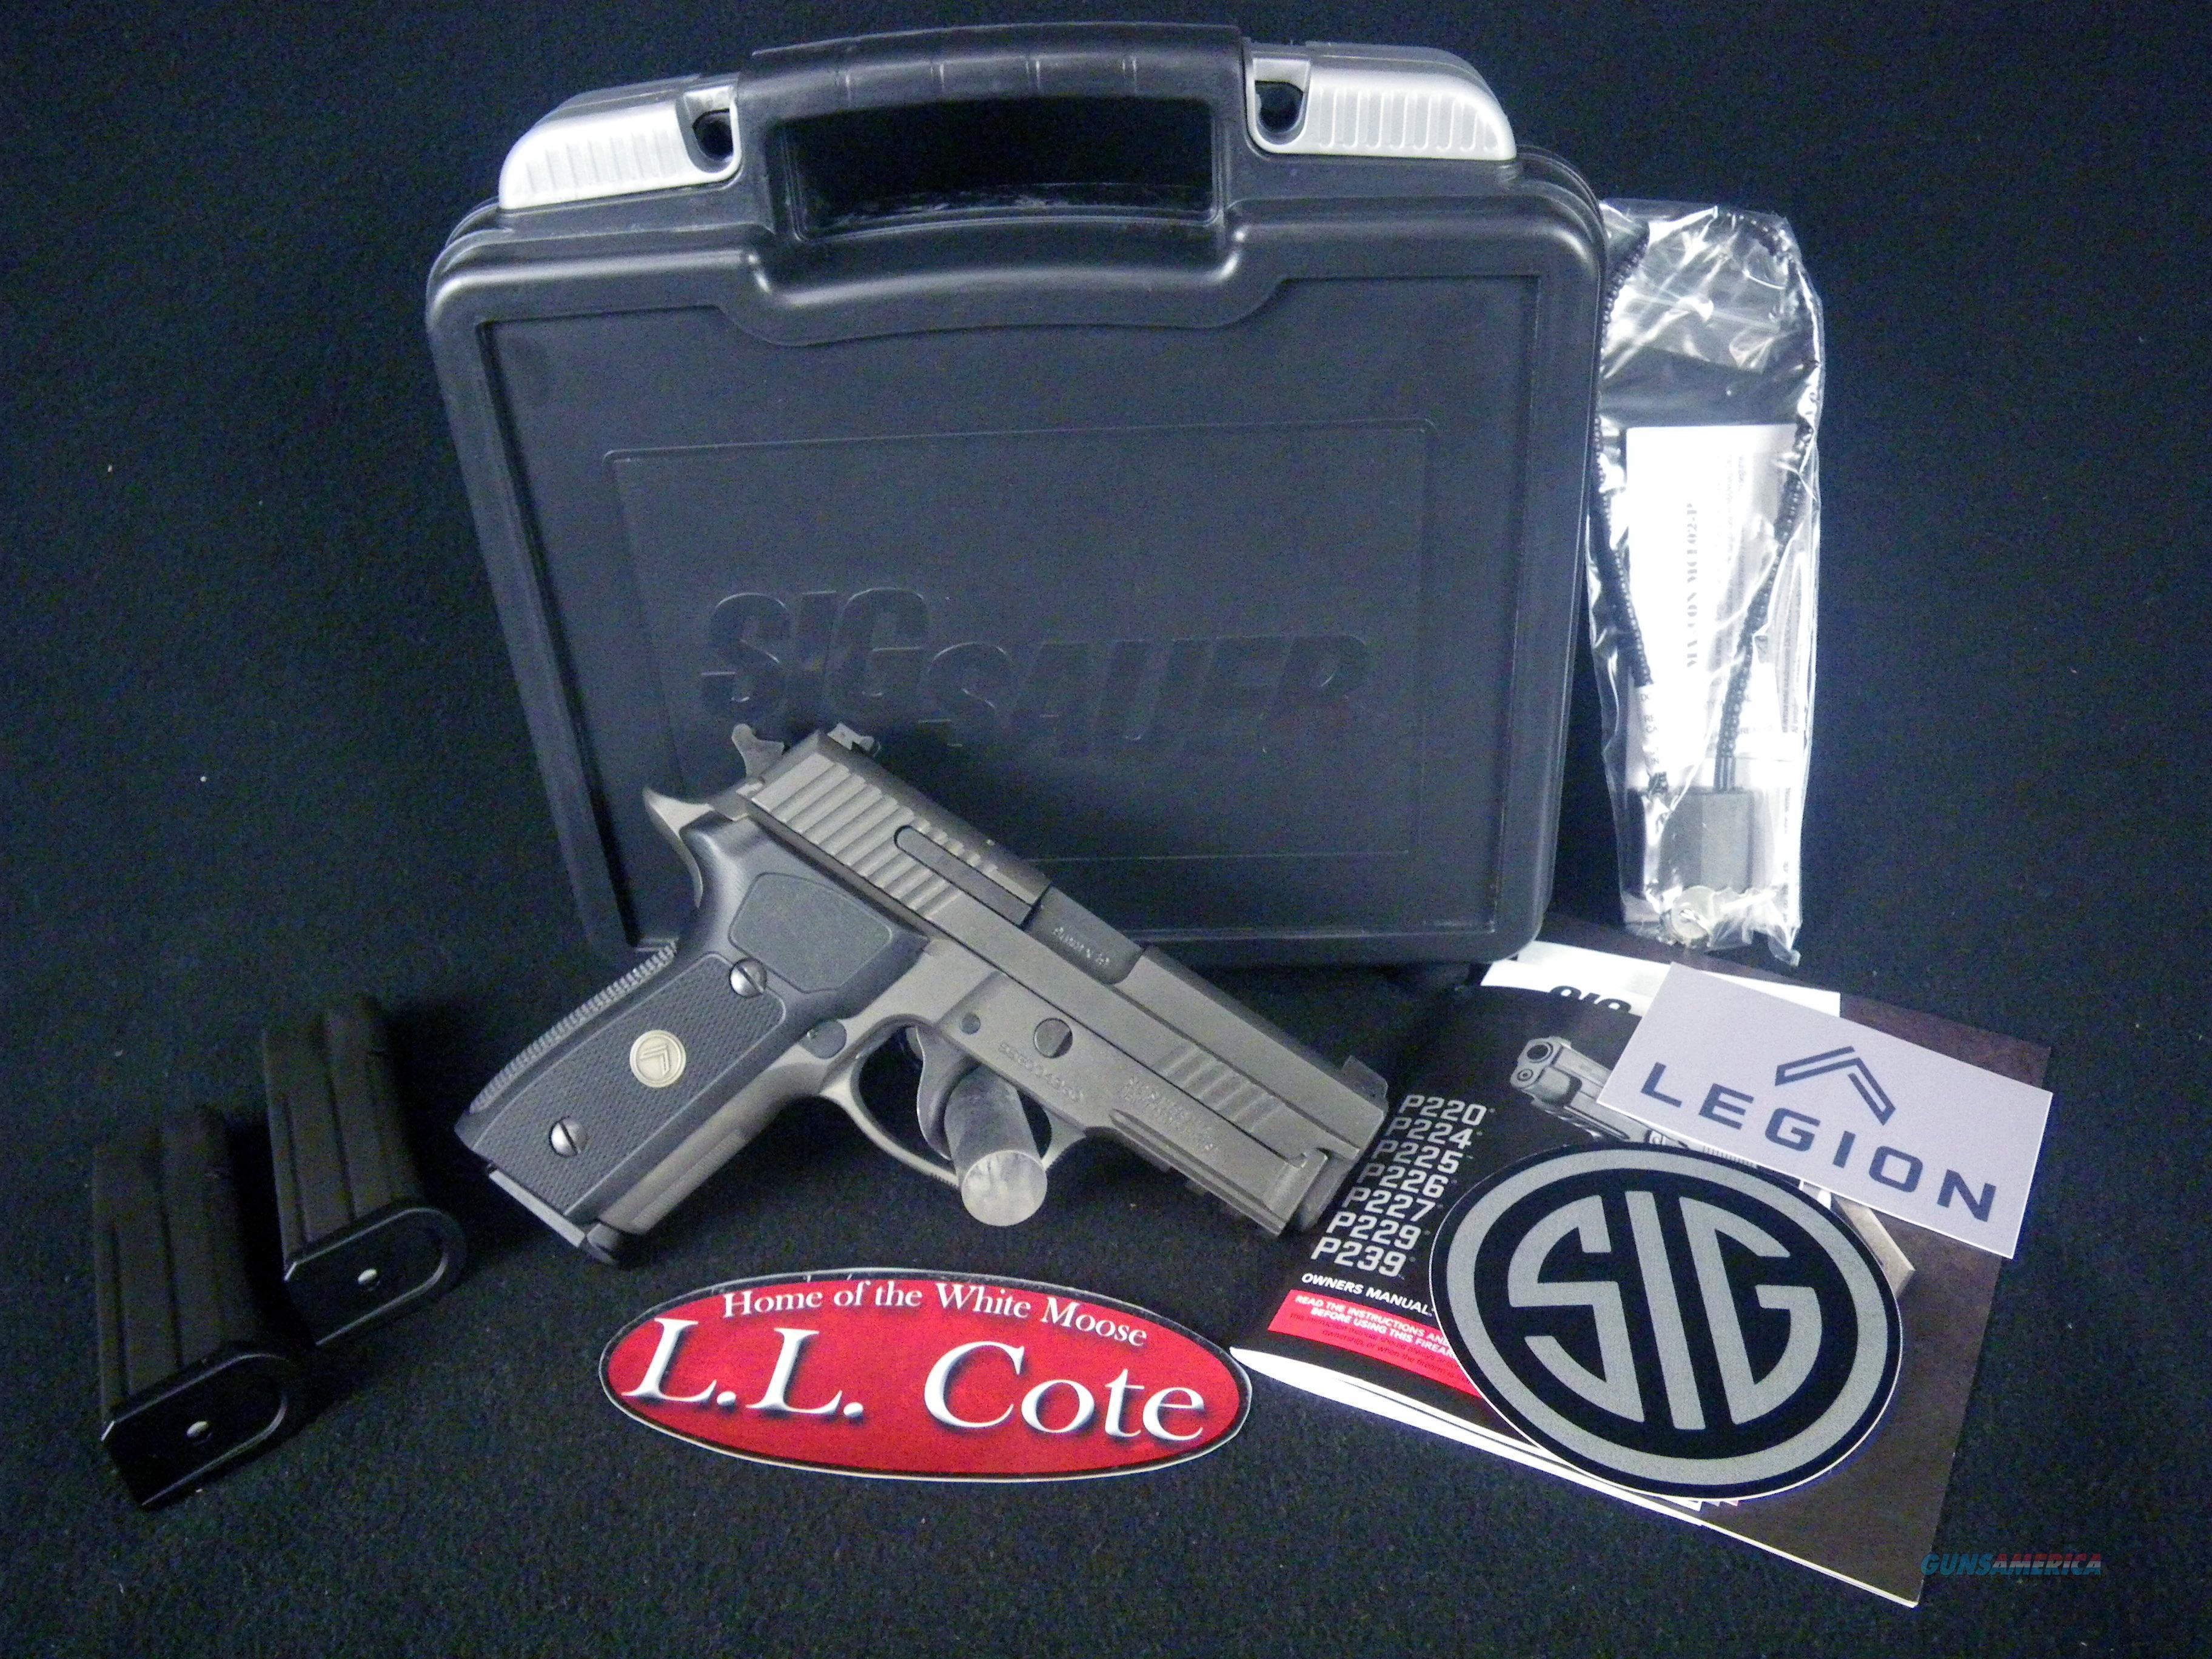 "Sig Sauer P229 Legion Compact PVD 9mm 3.9"" NEW E29R-9-LEGION  Guns > Pistols > Sig - Sauer/Sigarms Pistols > P229"